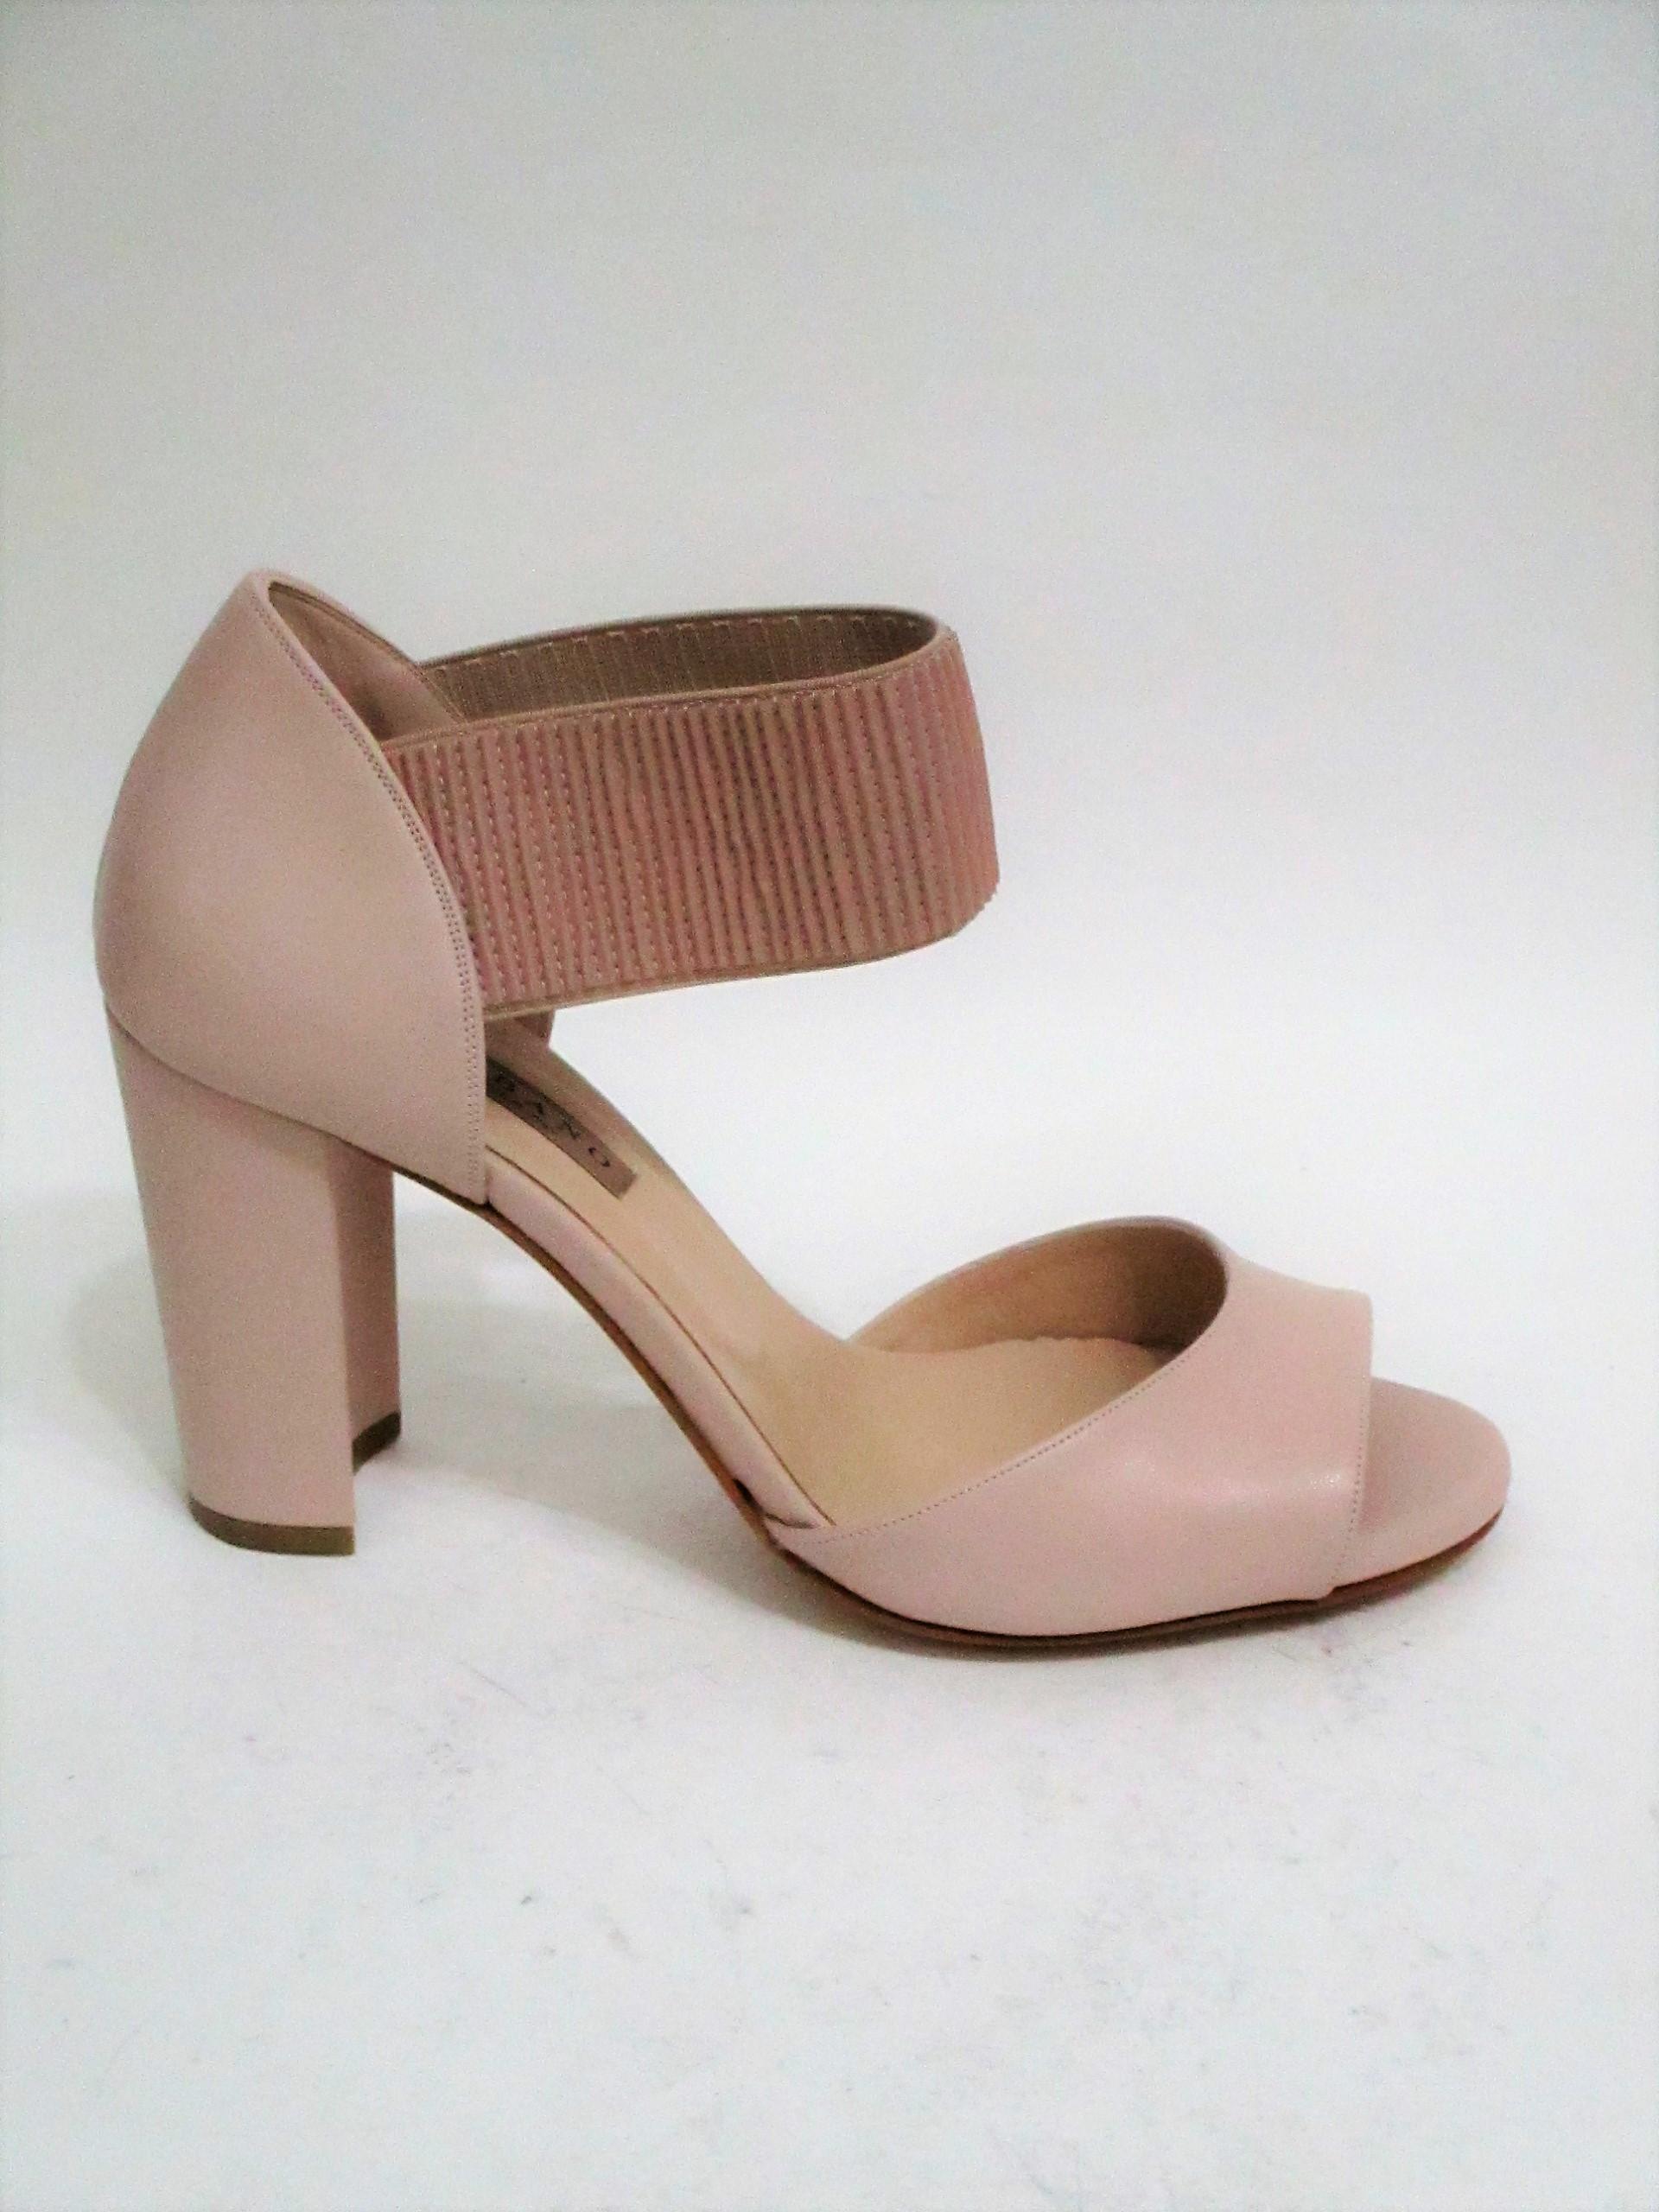 wholesale dealer 80c7e 905ce Sandalo Pelle Donna ALBANO 2090 Cipria